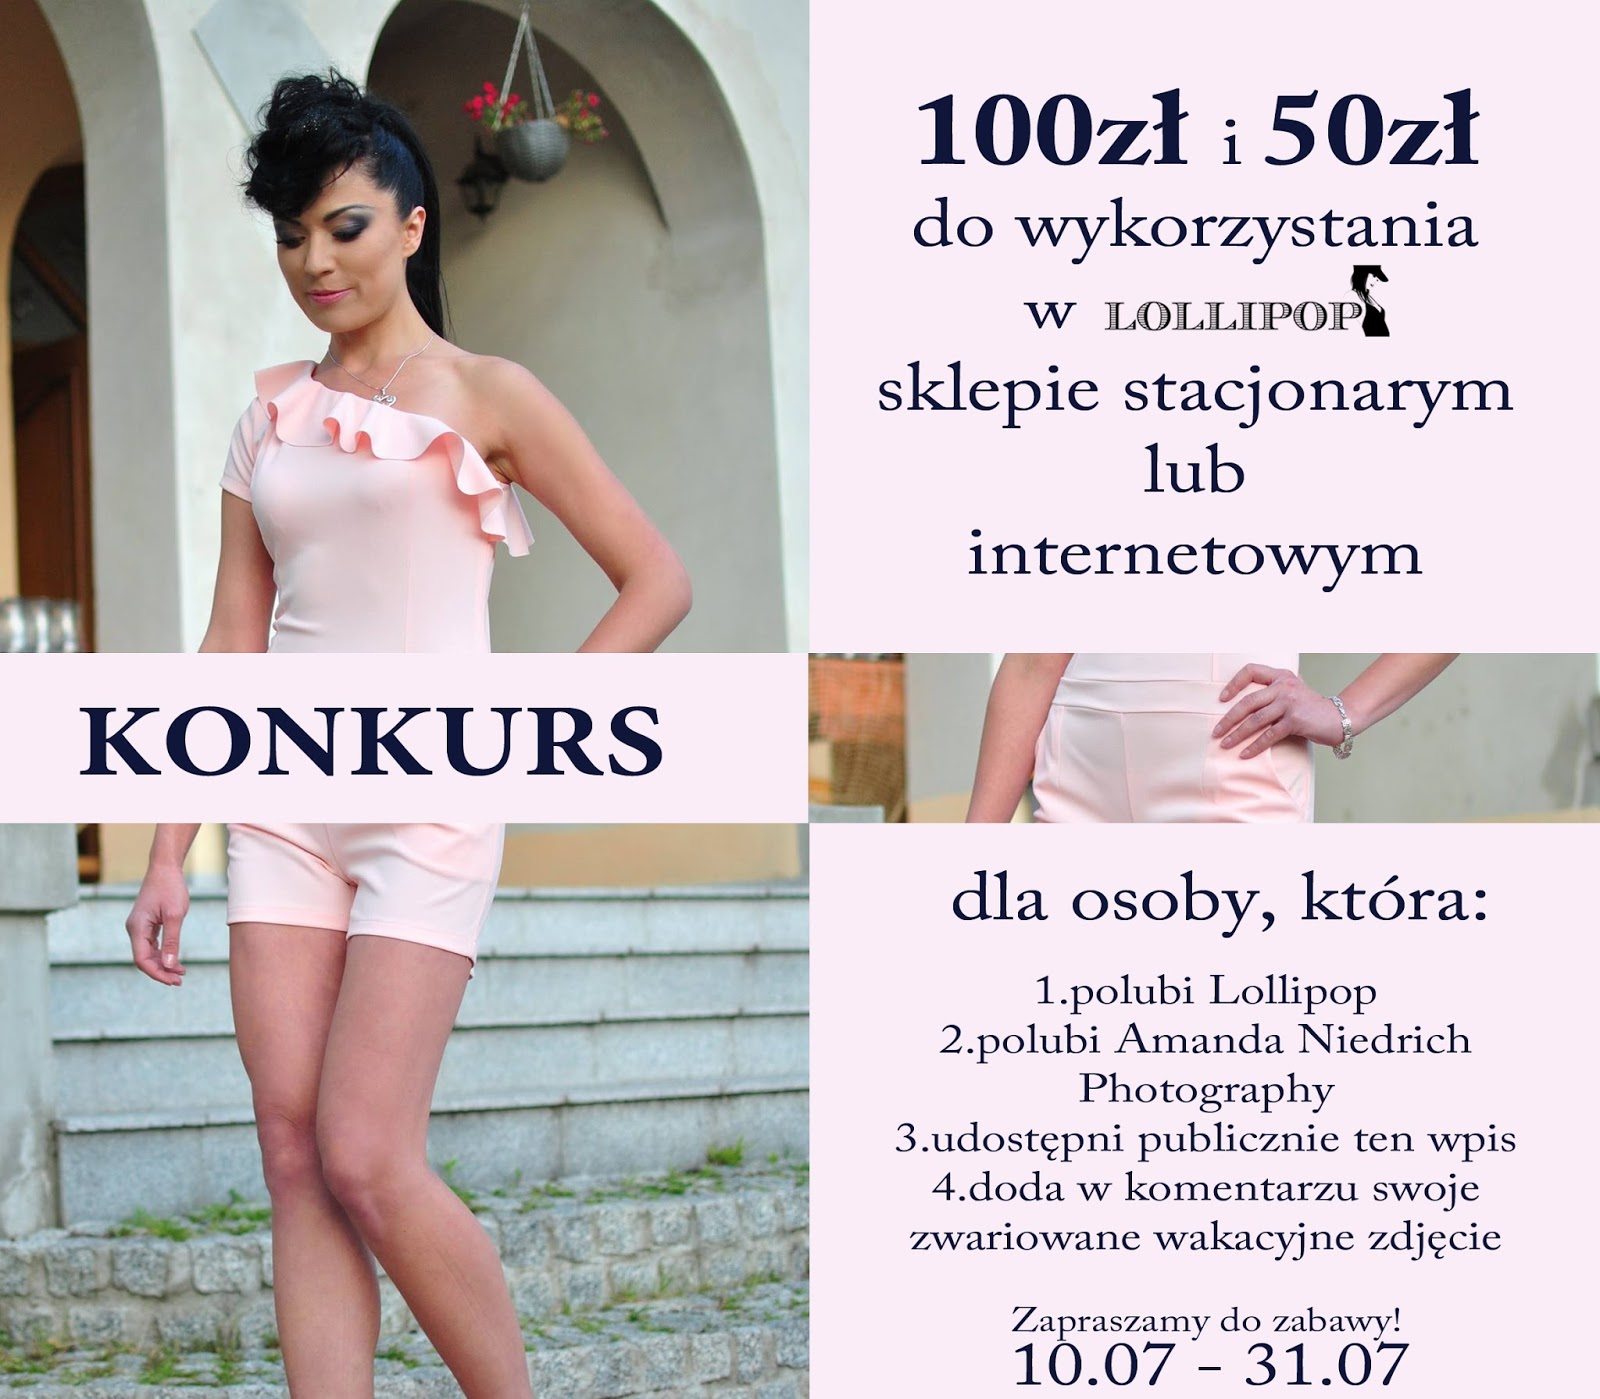 http://facebook.com/zdjeciaamandy